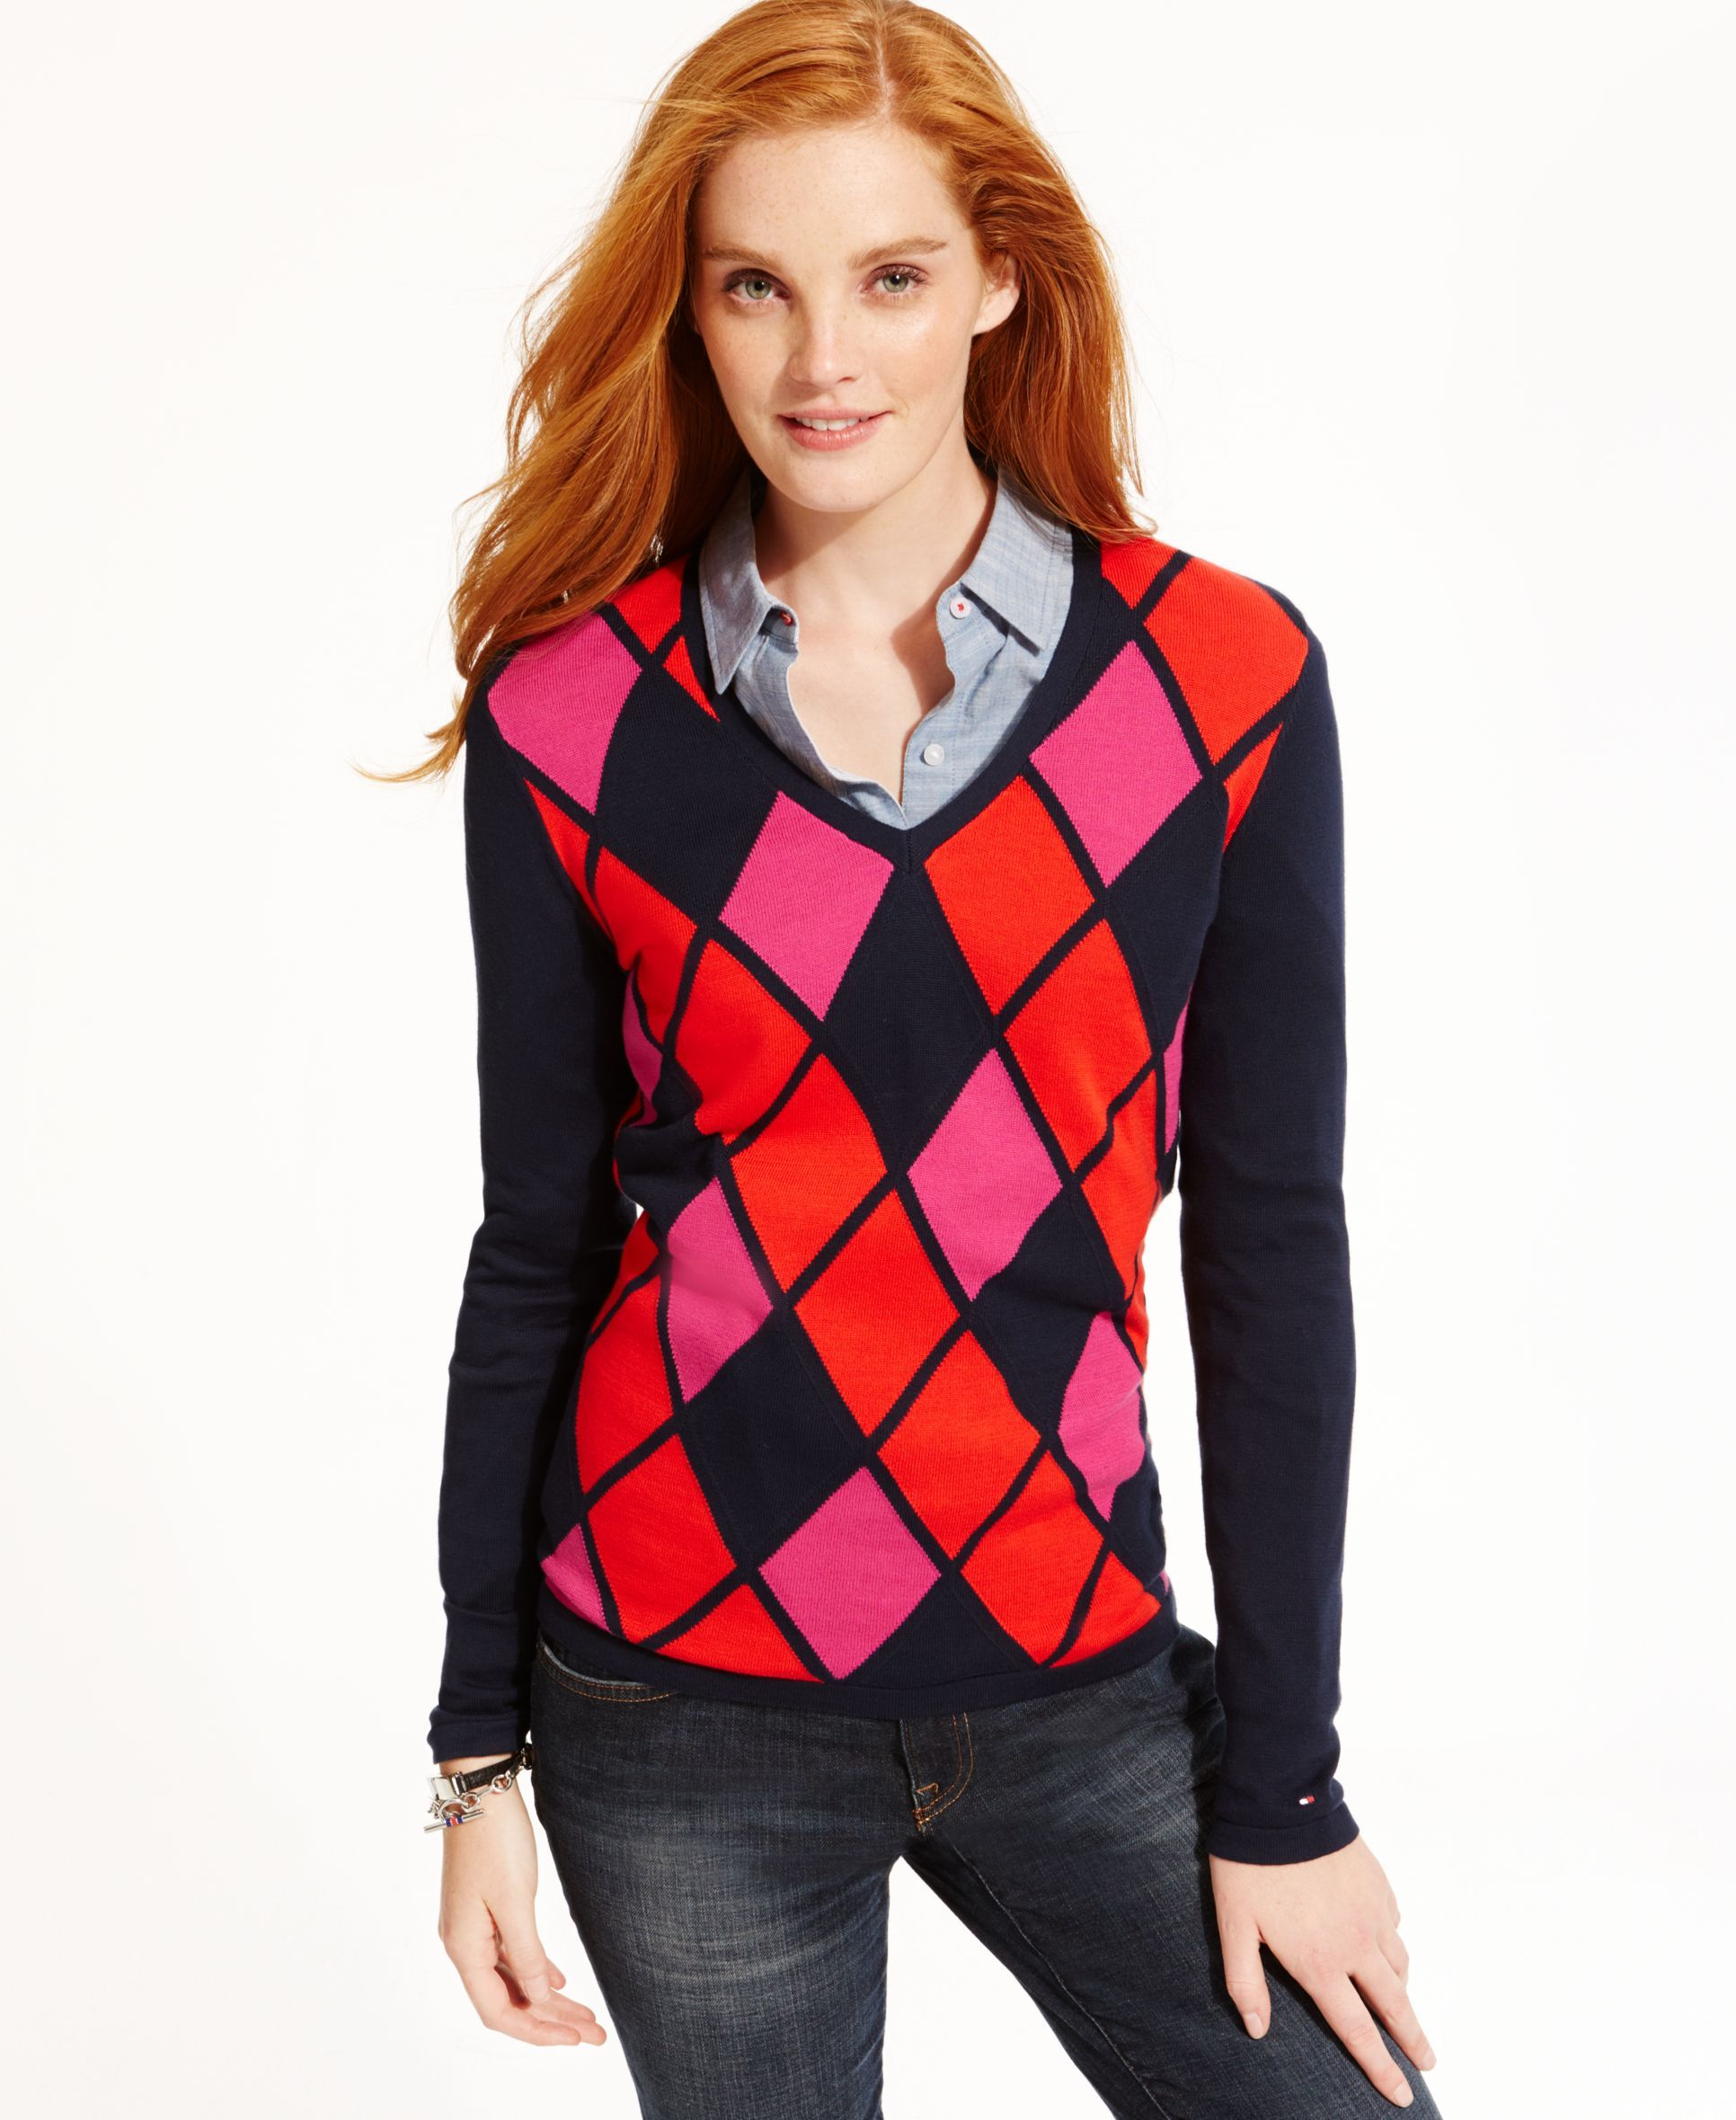 Tommy Hilfiger Argyle Sweater | Products | Pinterest | Shops ...